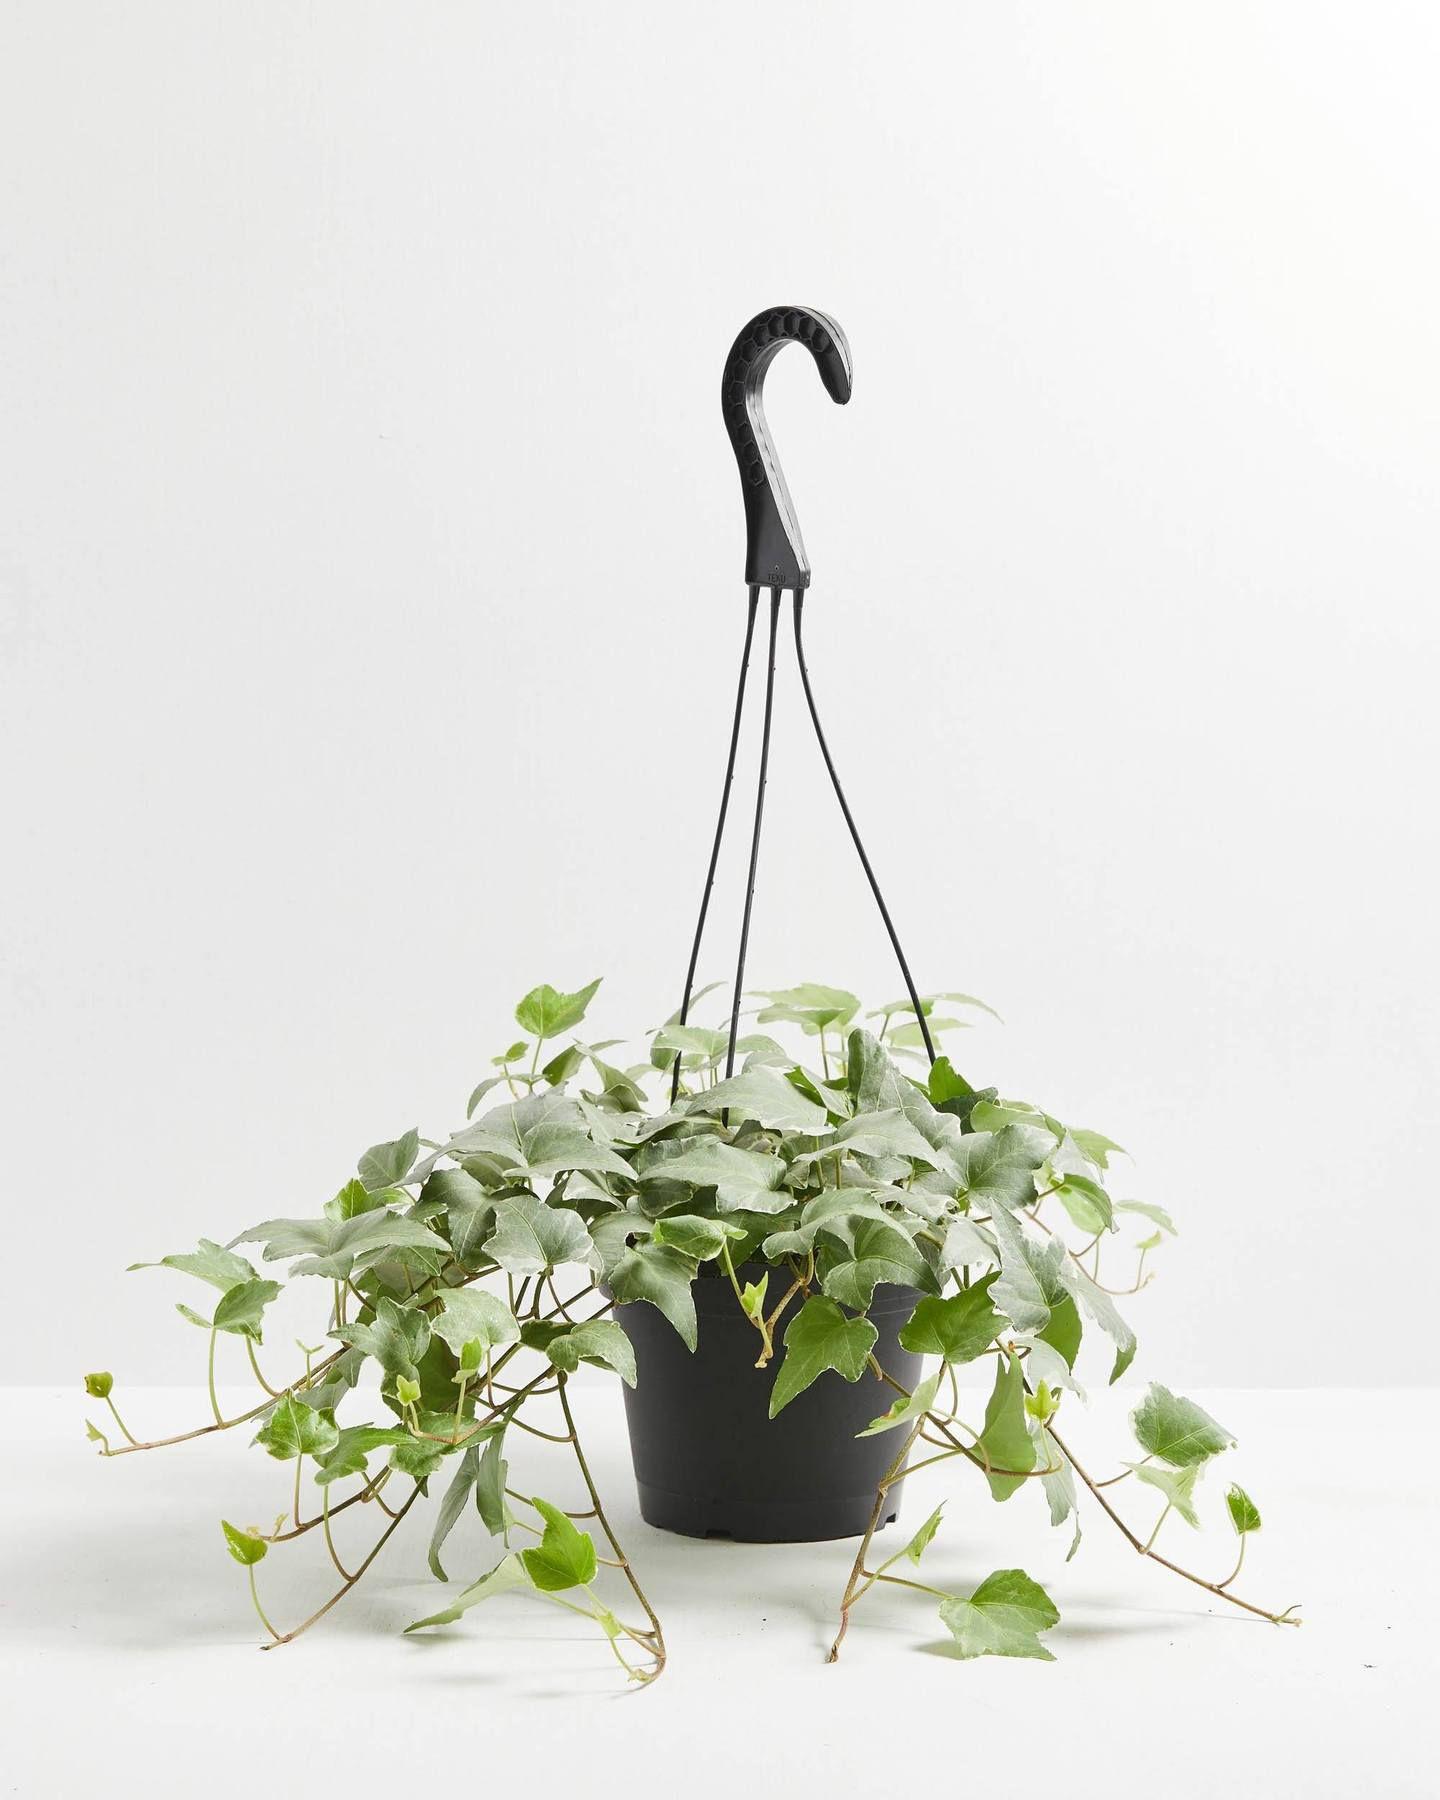 English ivy glacier in a black hanging planter